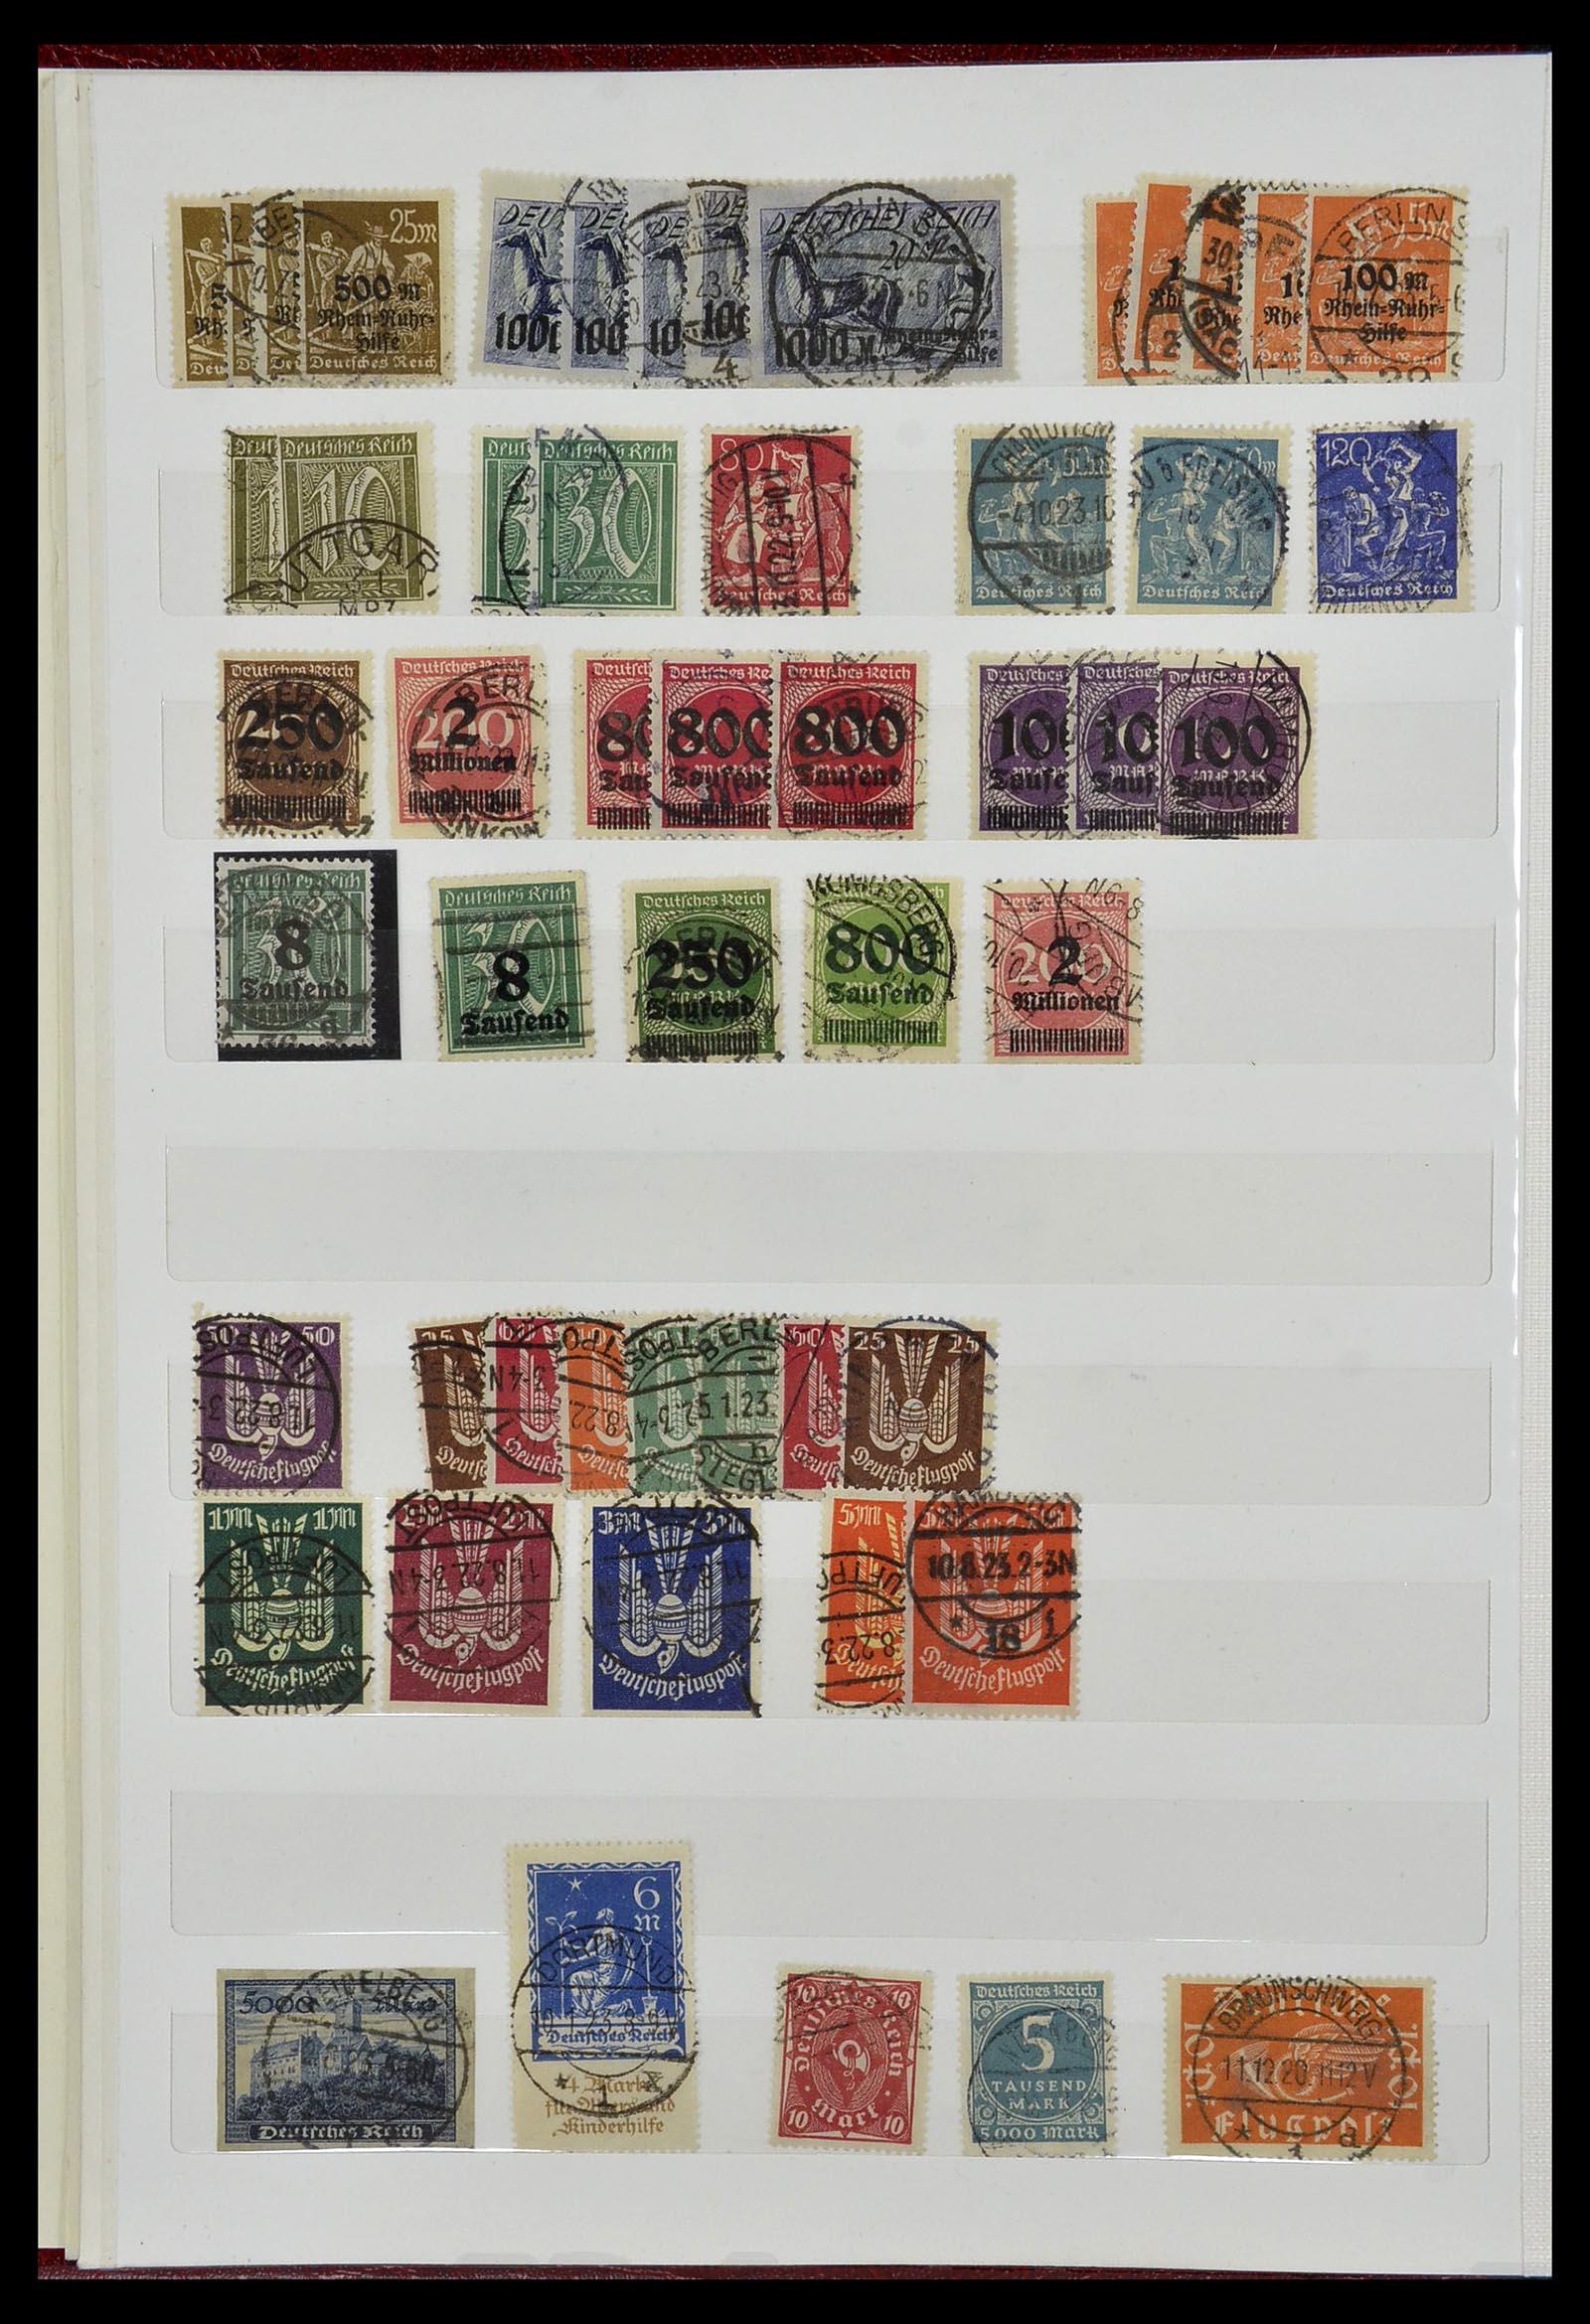 34069 002 - Postzegelverzameling 34069 Duitsland 1855-1952.